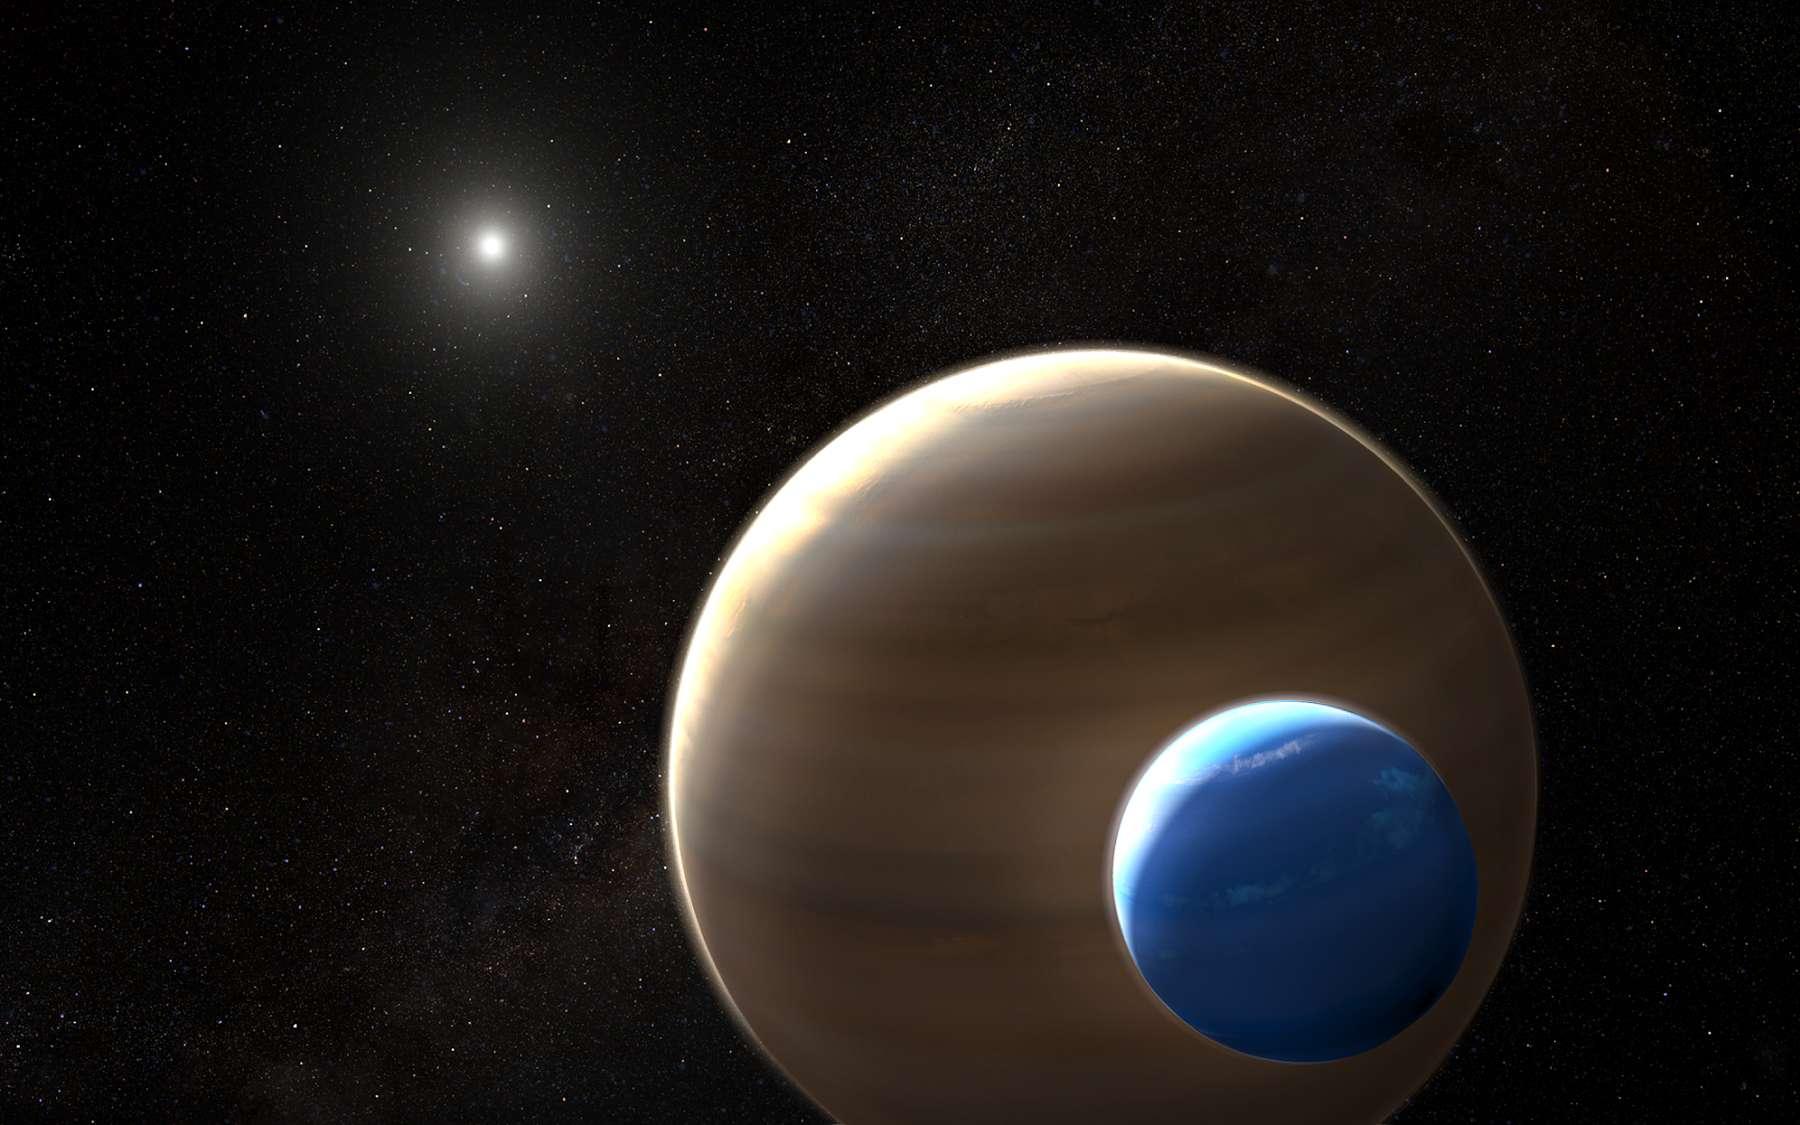 Vue d'artiste de l'exoplanète Kepler-1625b, une super-Jupiter, accompagnée d'une potentielle exolune gazeuse similaire à Neptune appelée Kepler-1625b-i. © Nasa/ESA/L. Hustak